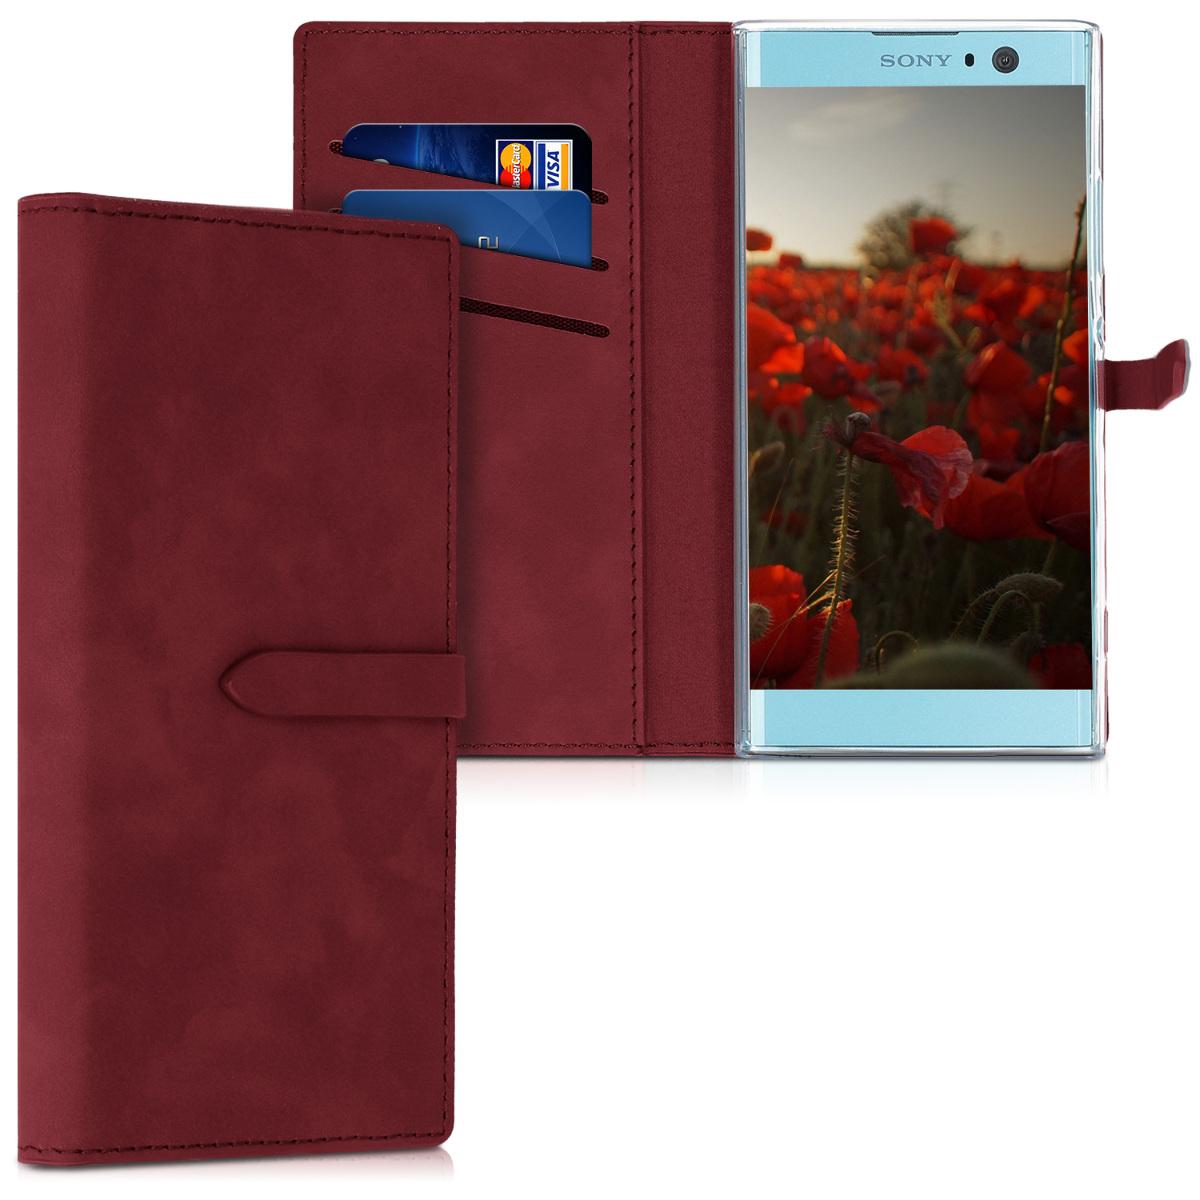 KW Θήκη Πορτοφόλι Sony Xperia XA2 - Nubuck Δέρμα - Dark Red (47054.20)